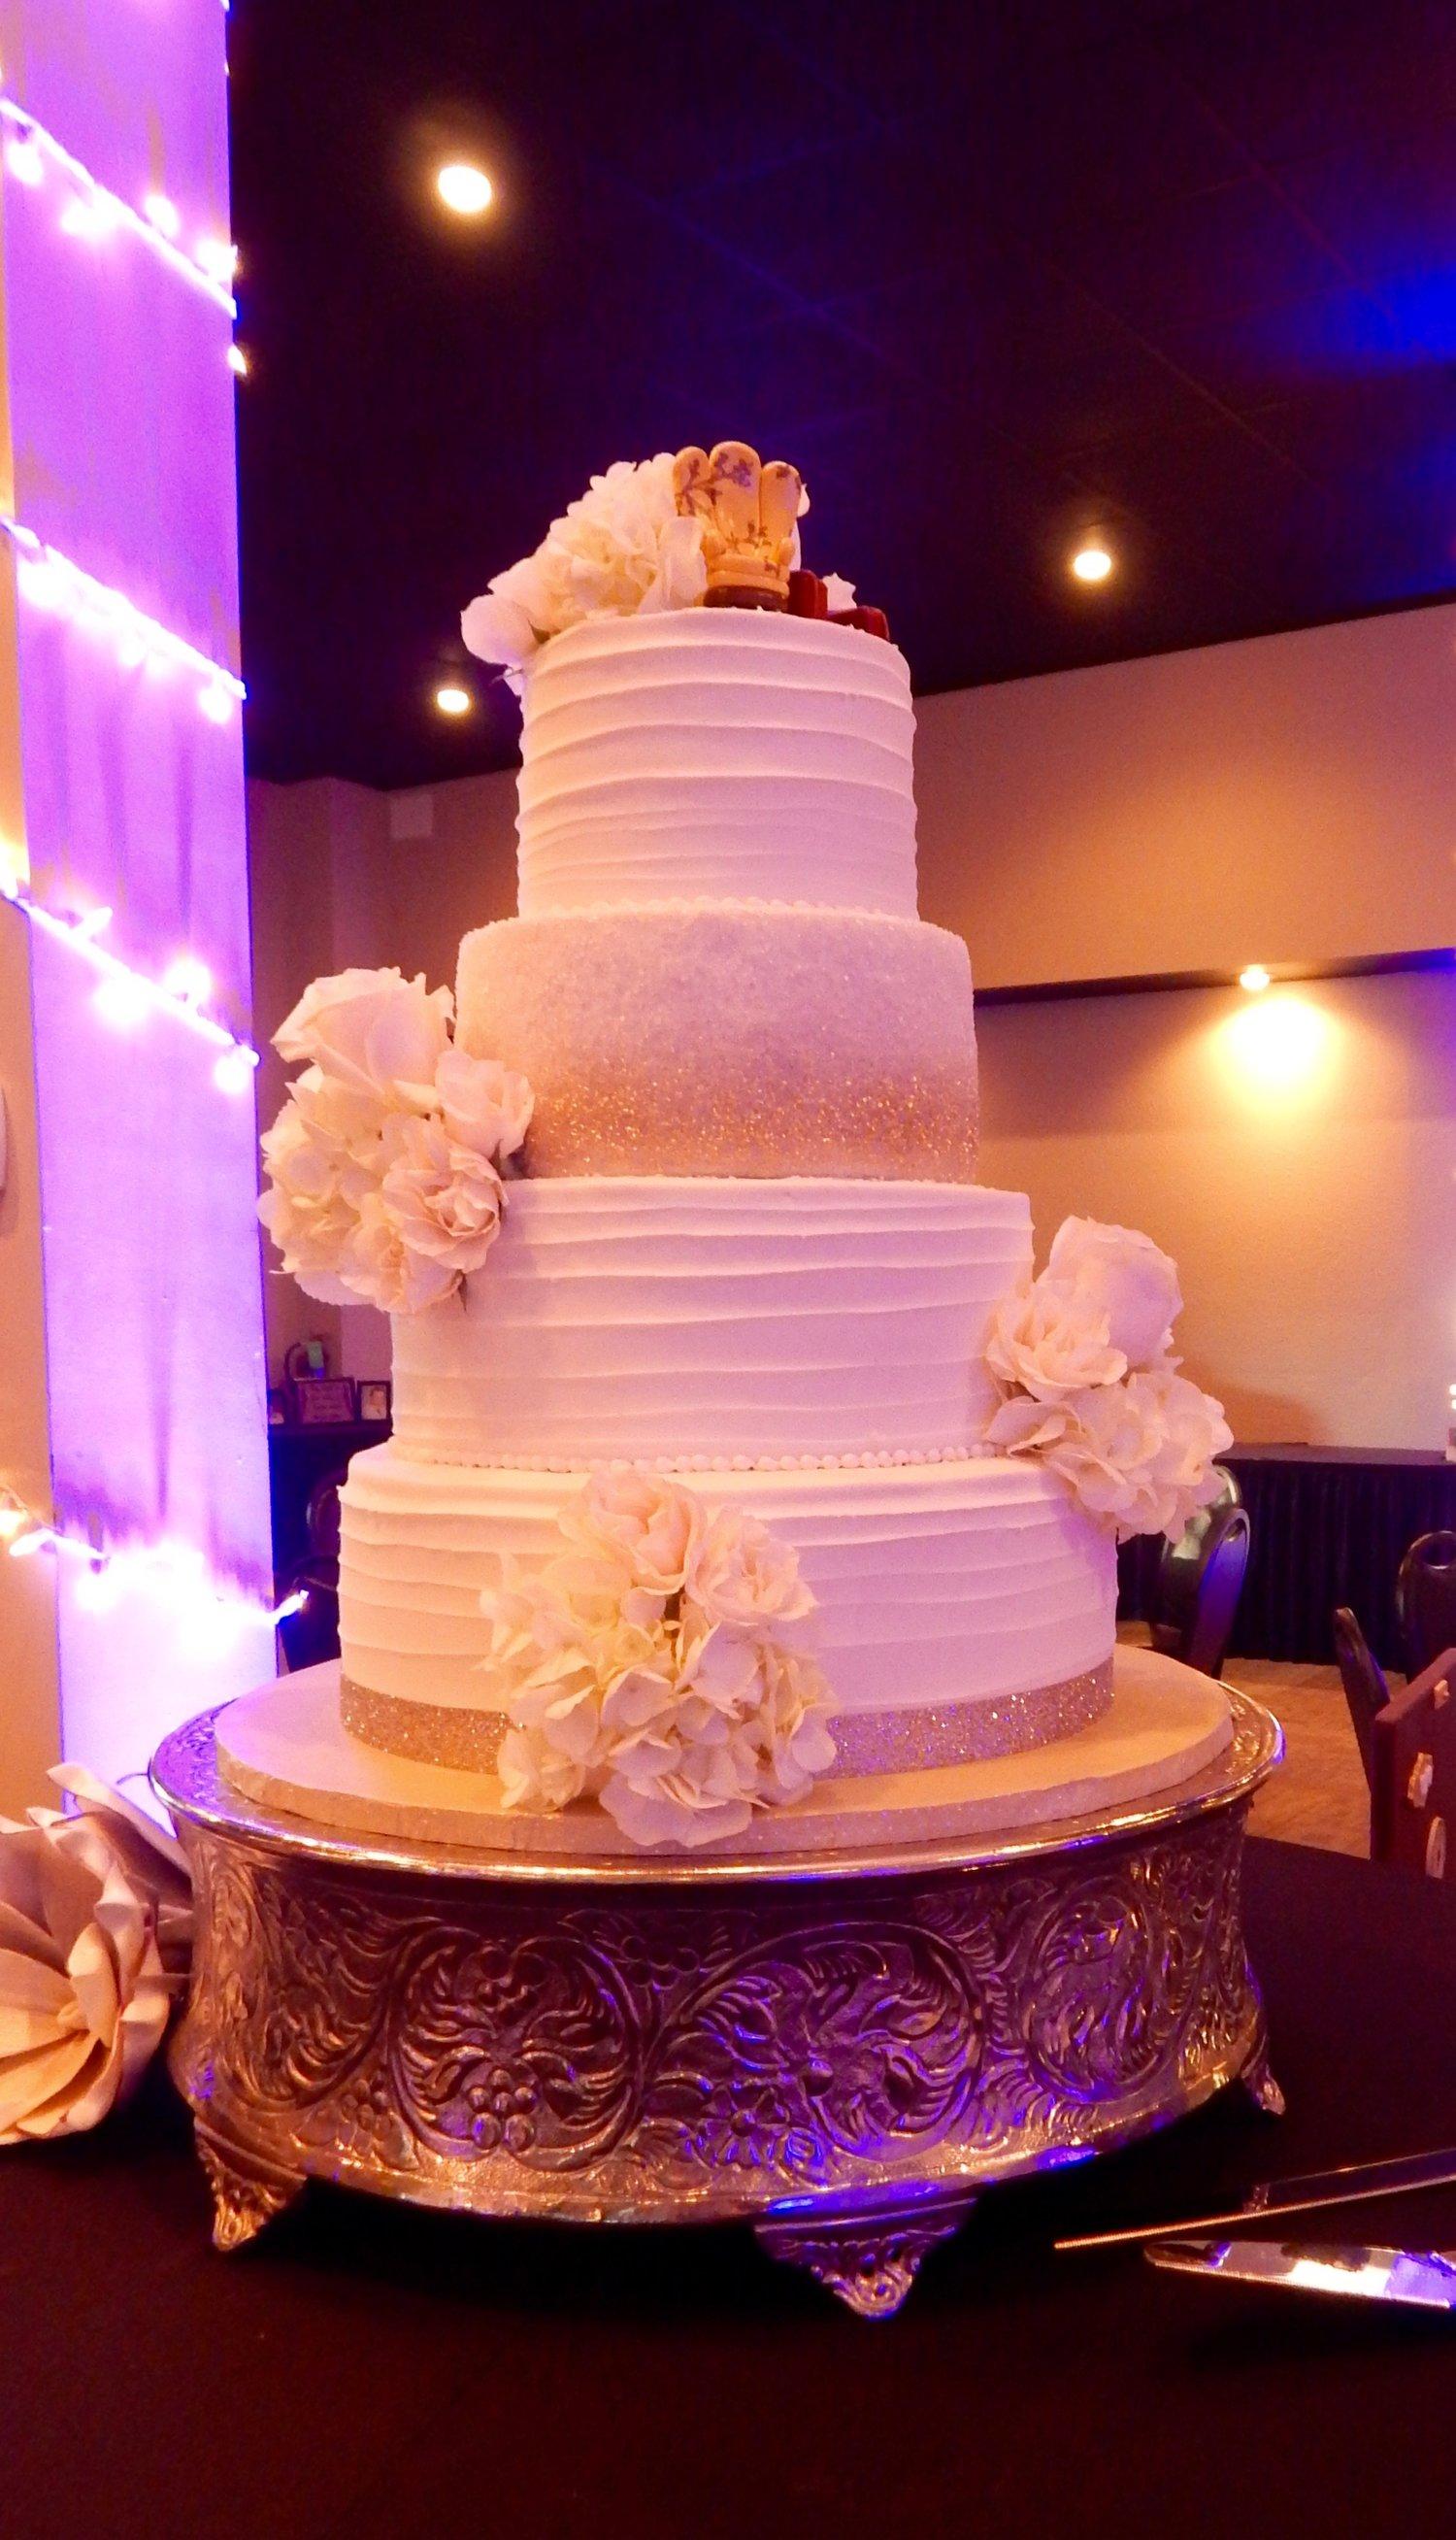 Cake Worthy Design